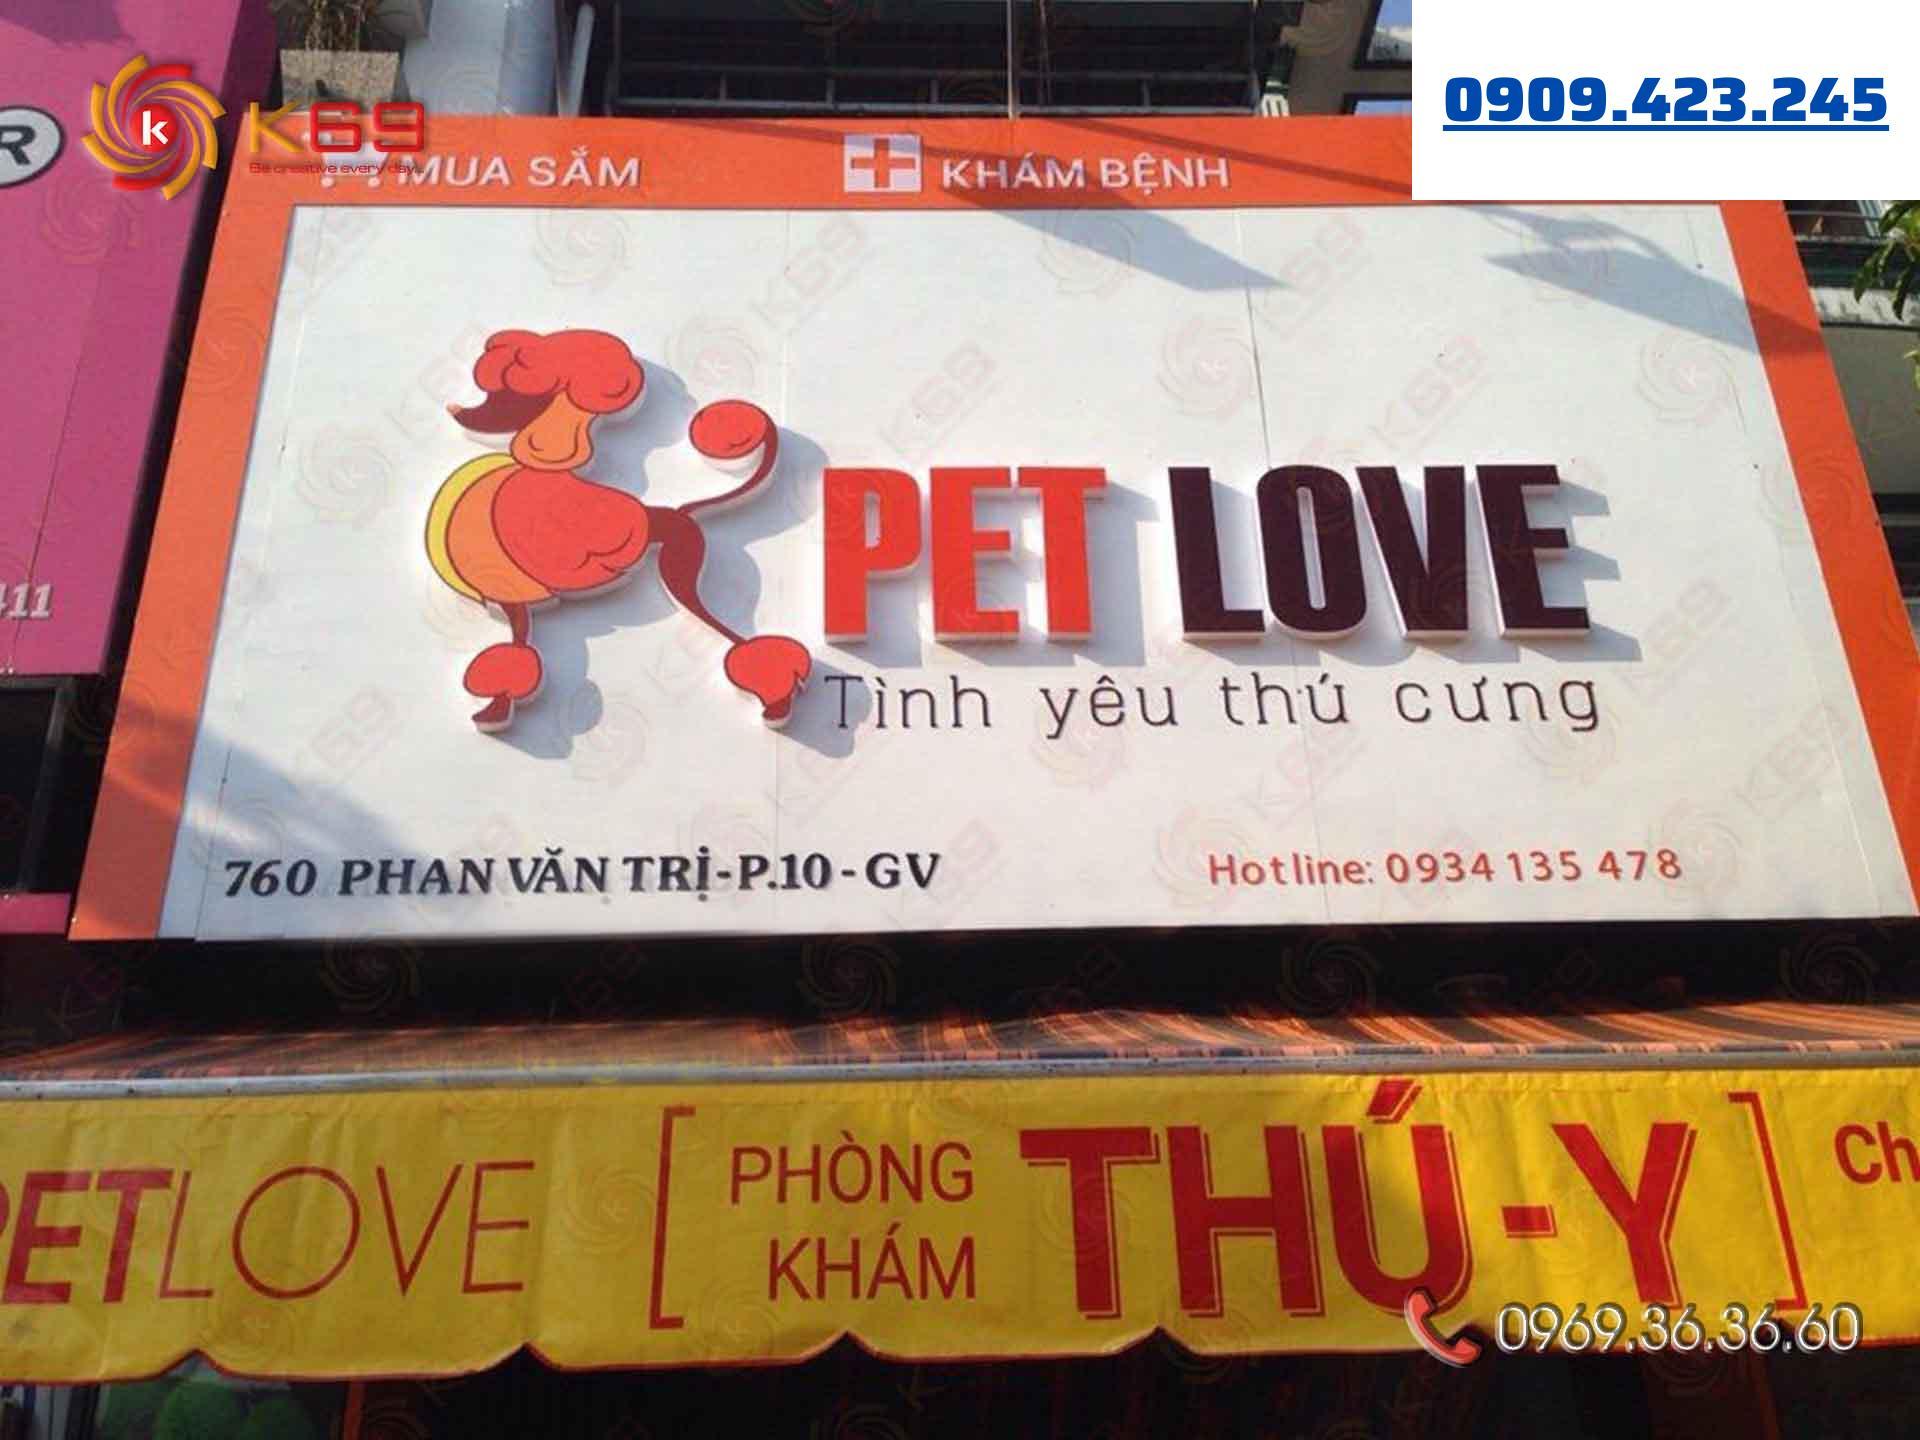 Mẫu bảng hiệu Pet love đẹp tại K69adv